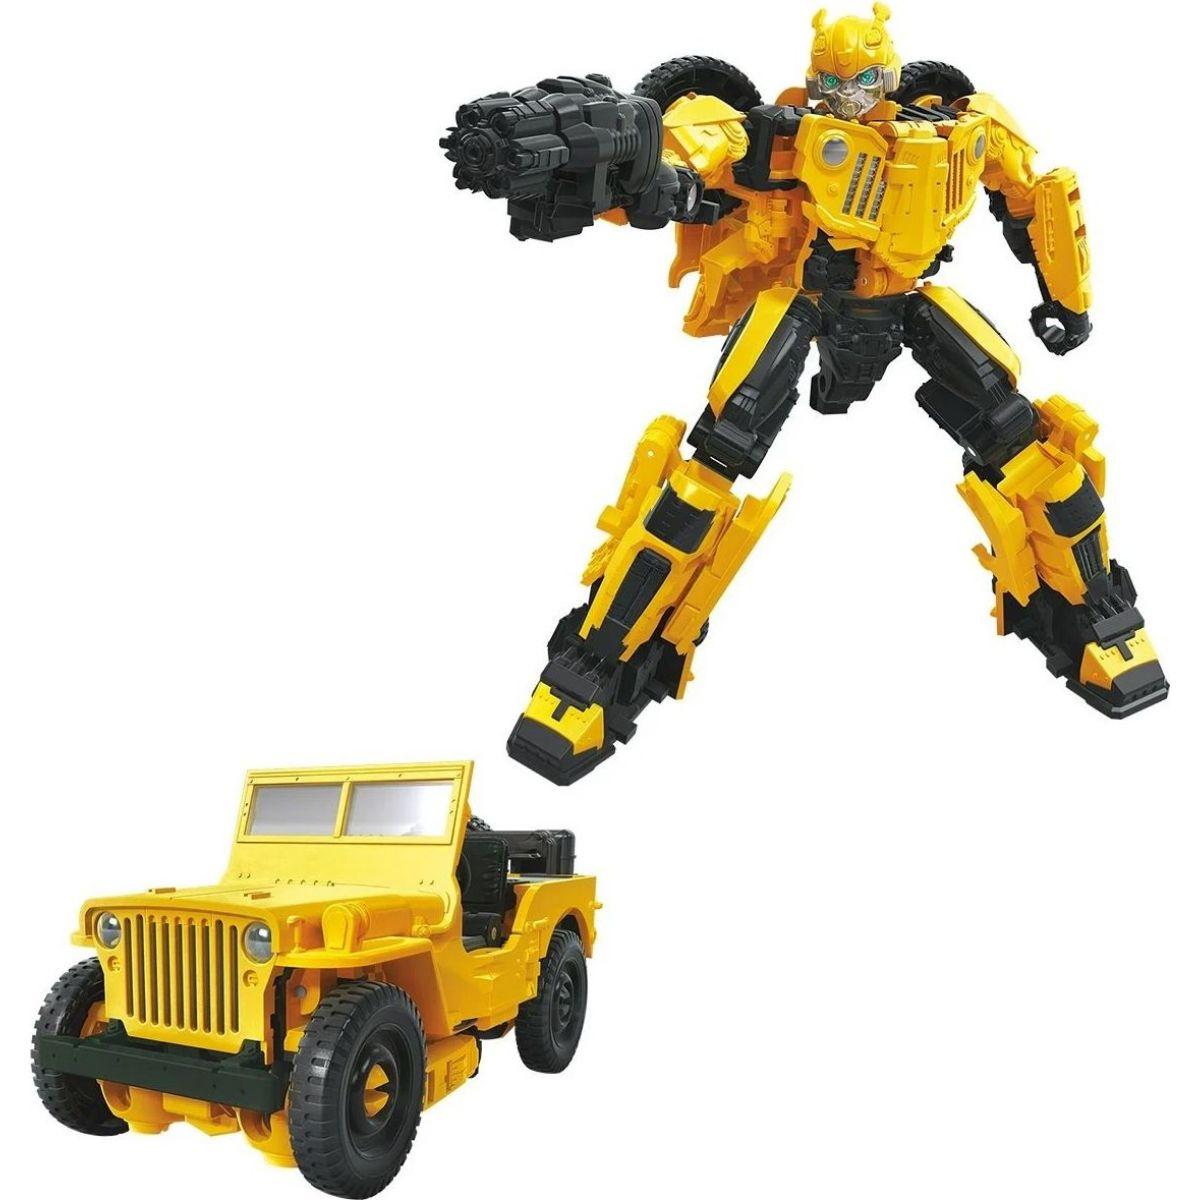 Hasbro Transformers Generations filmová figúrka radu Deluxe Bumblebee offroad